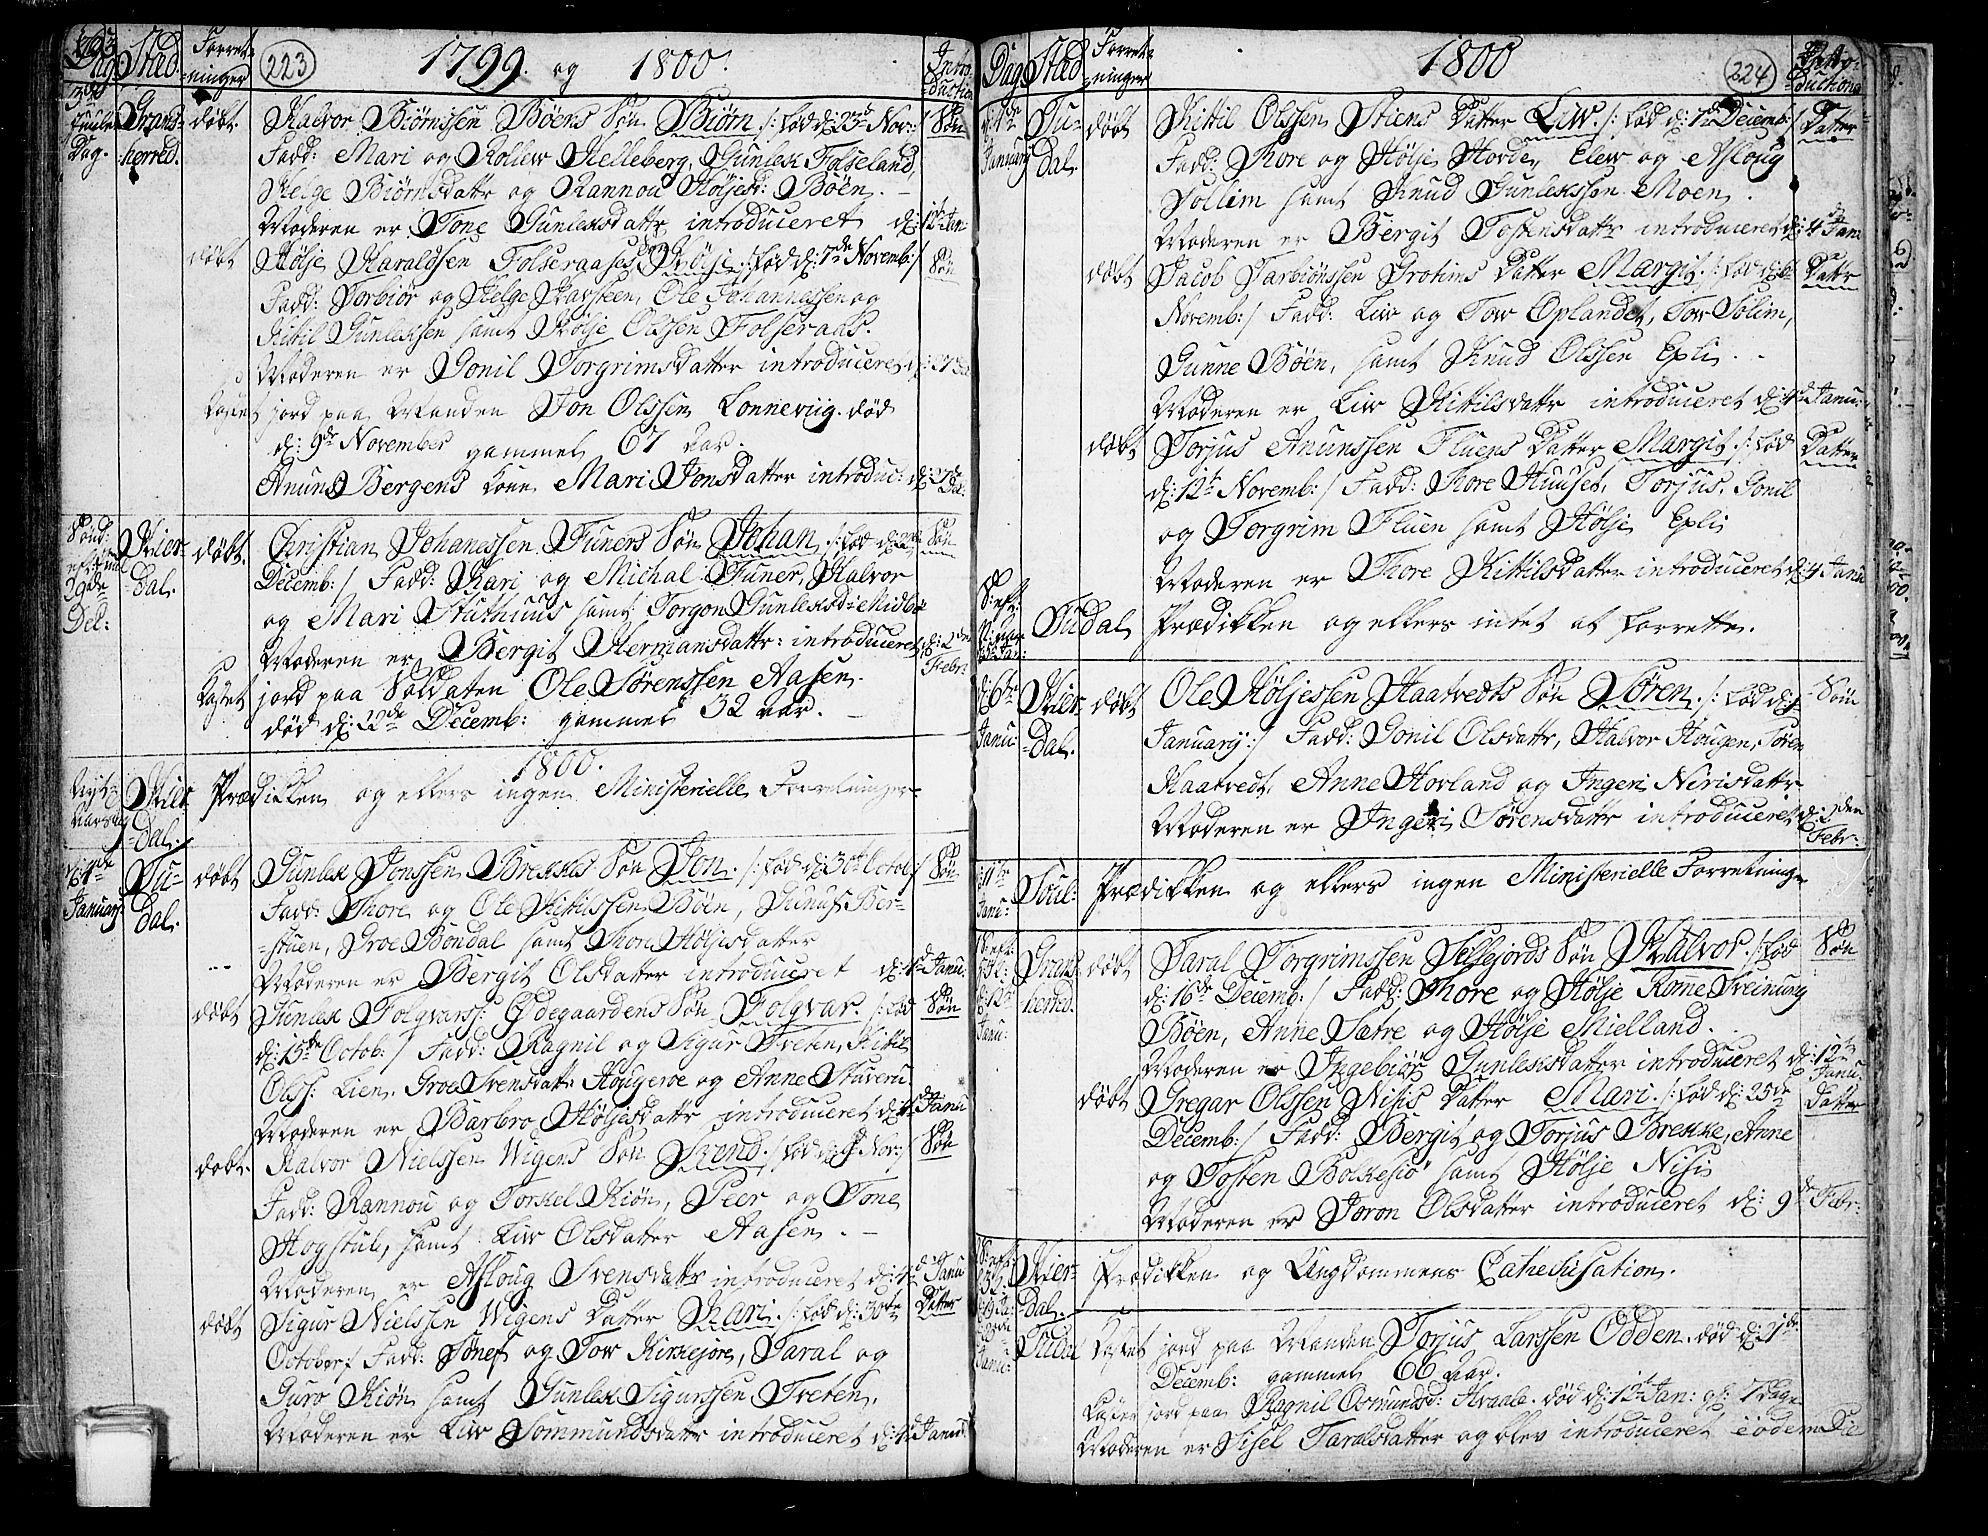 SAKO, Hjartdal kirkebøker, F/Fa/L0005: Ministerialbok nr. I 5, 1776-1801, s. 223-224